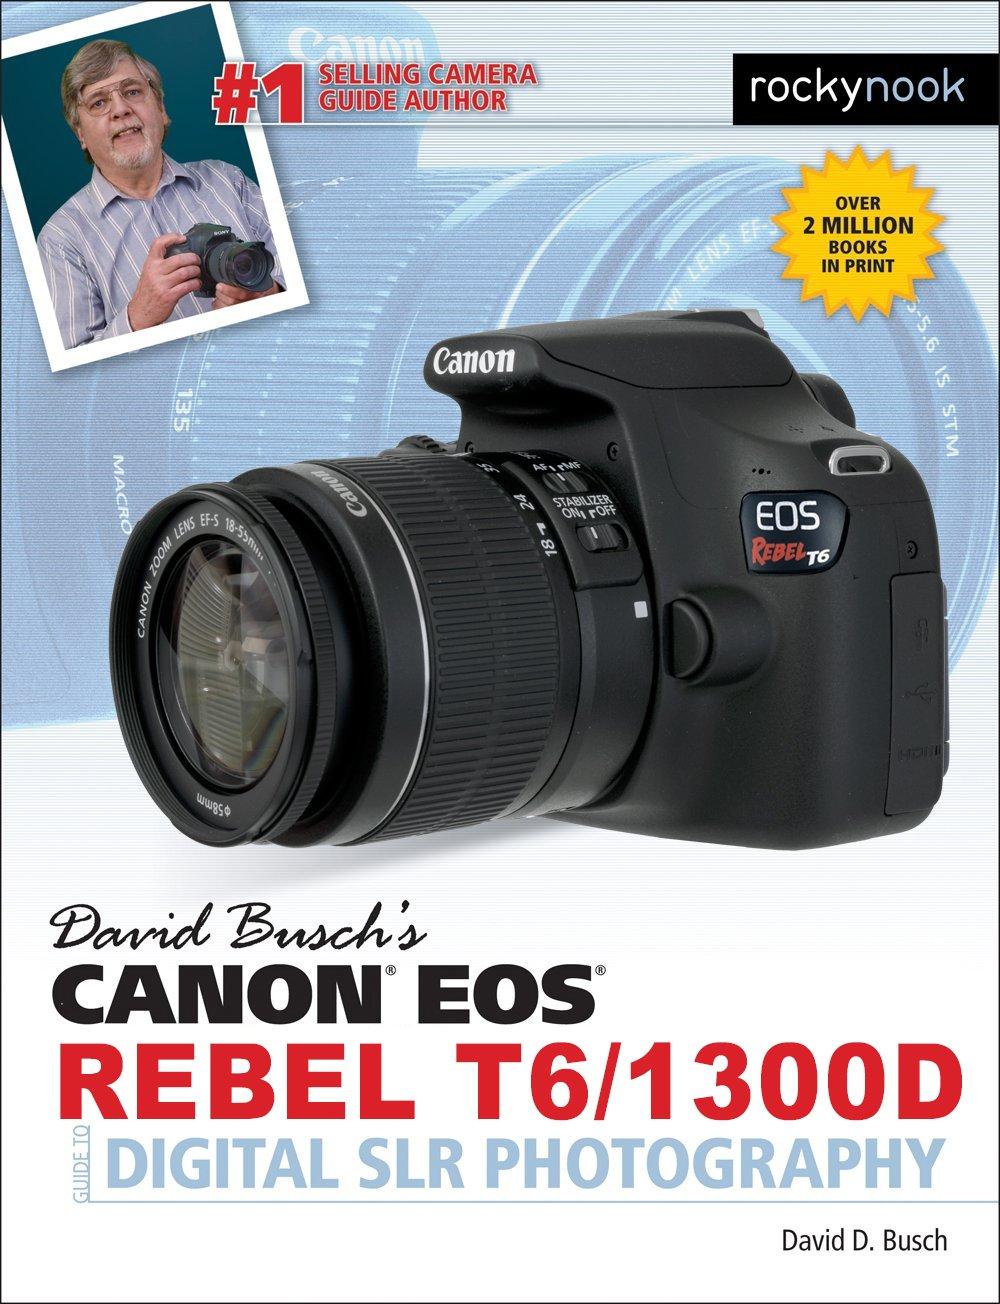 David Busch's Canon EOS Rebel T6/1300D Guide to Digital SLR